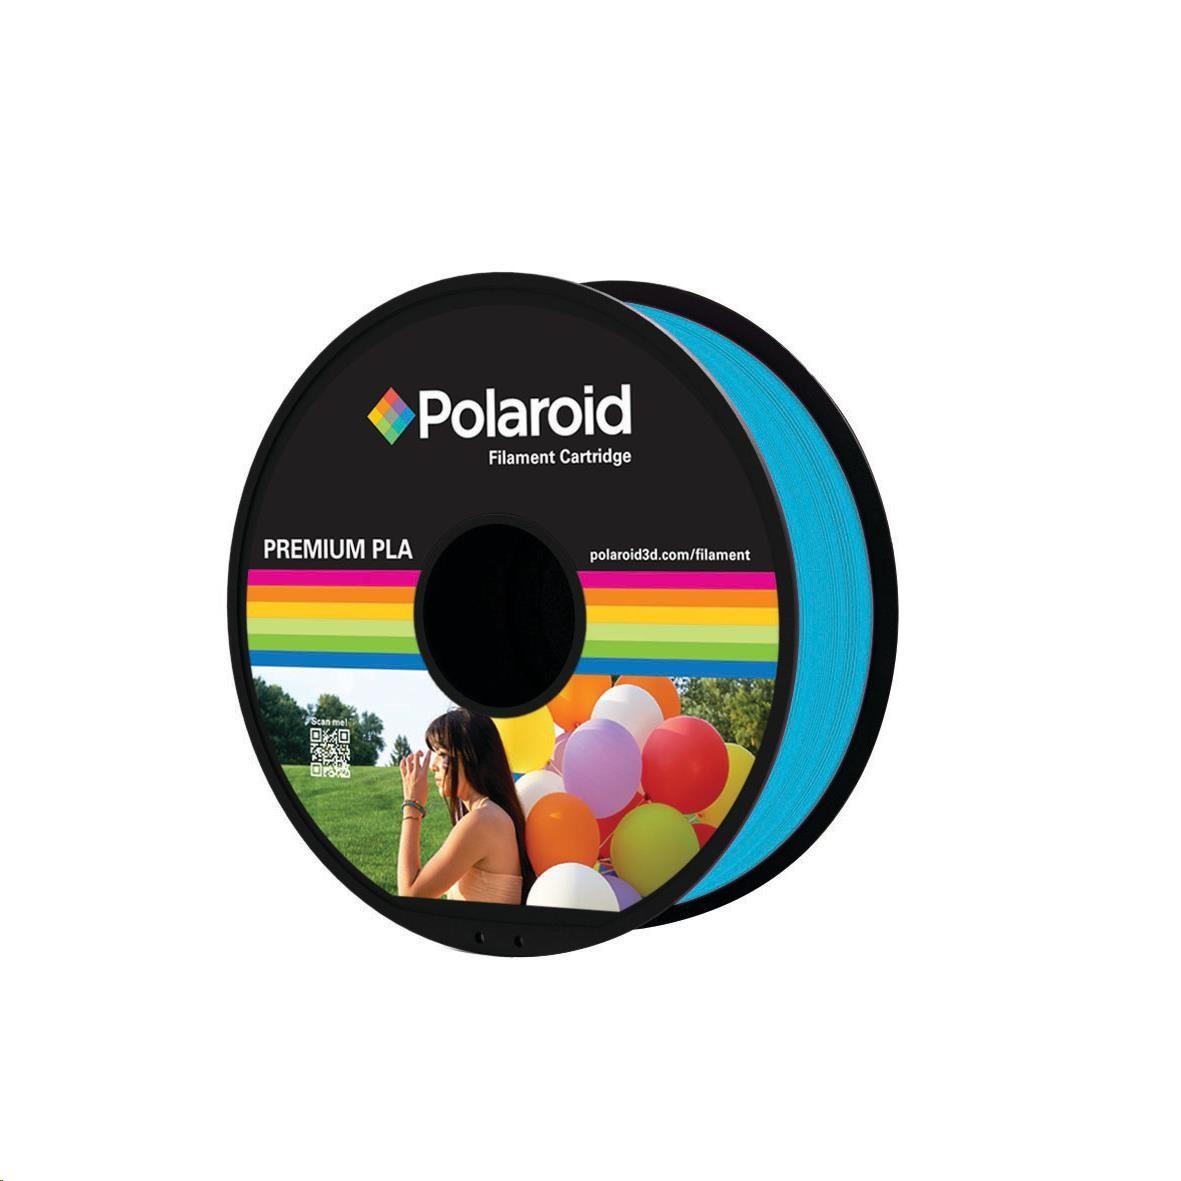 Polaroid PL-8018-00 tisková struna 1kg Universal Premium PLA filament, 1.75mm/tisková struna 1kg - Light Blue